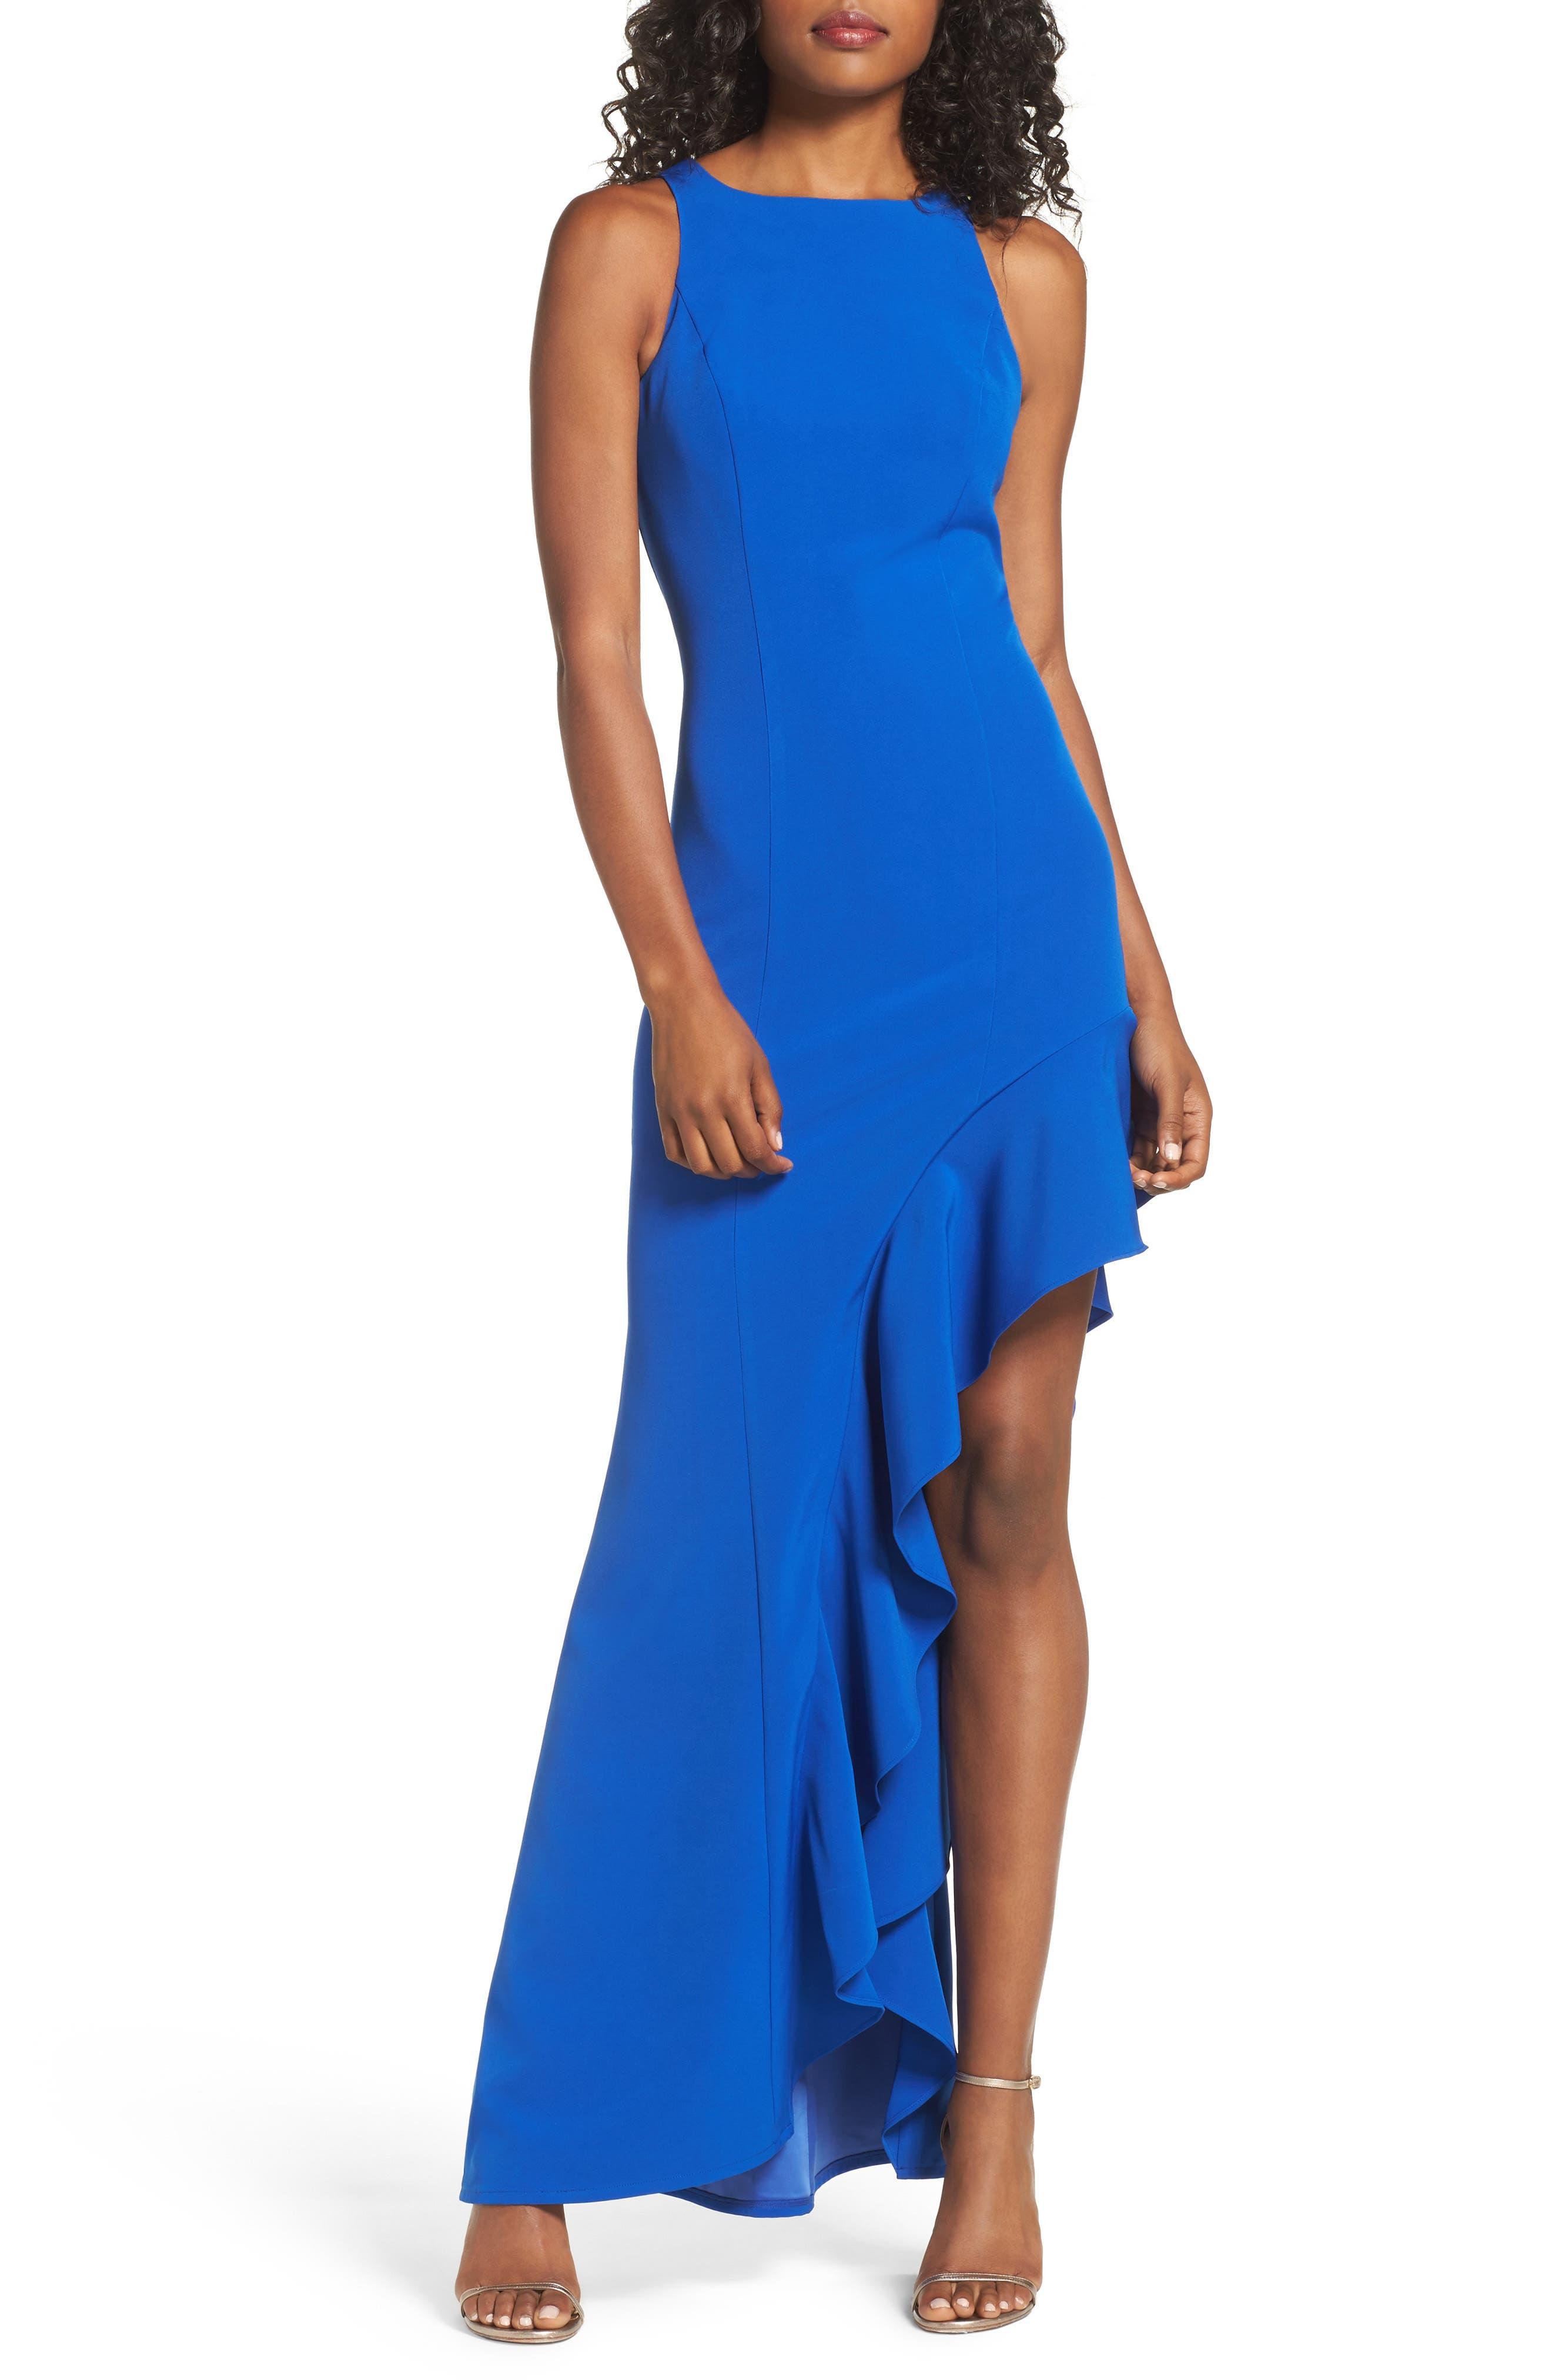 Jay by Jay Godfrey Stella Asymmetrical Ruffle Gown